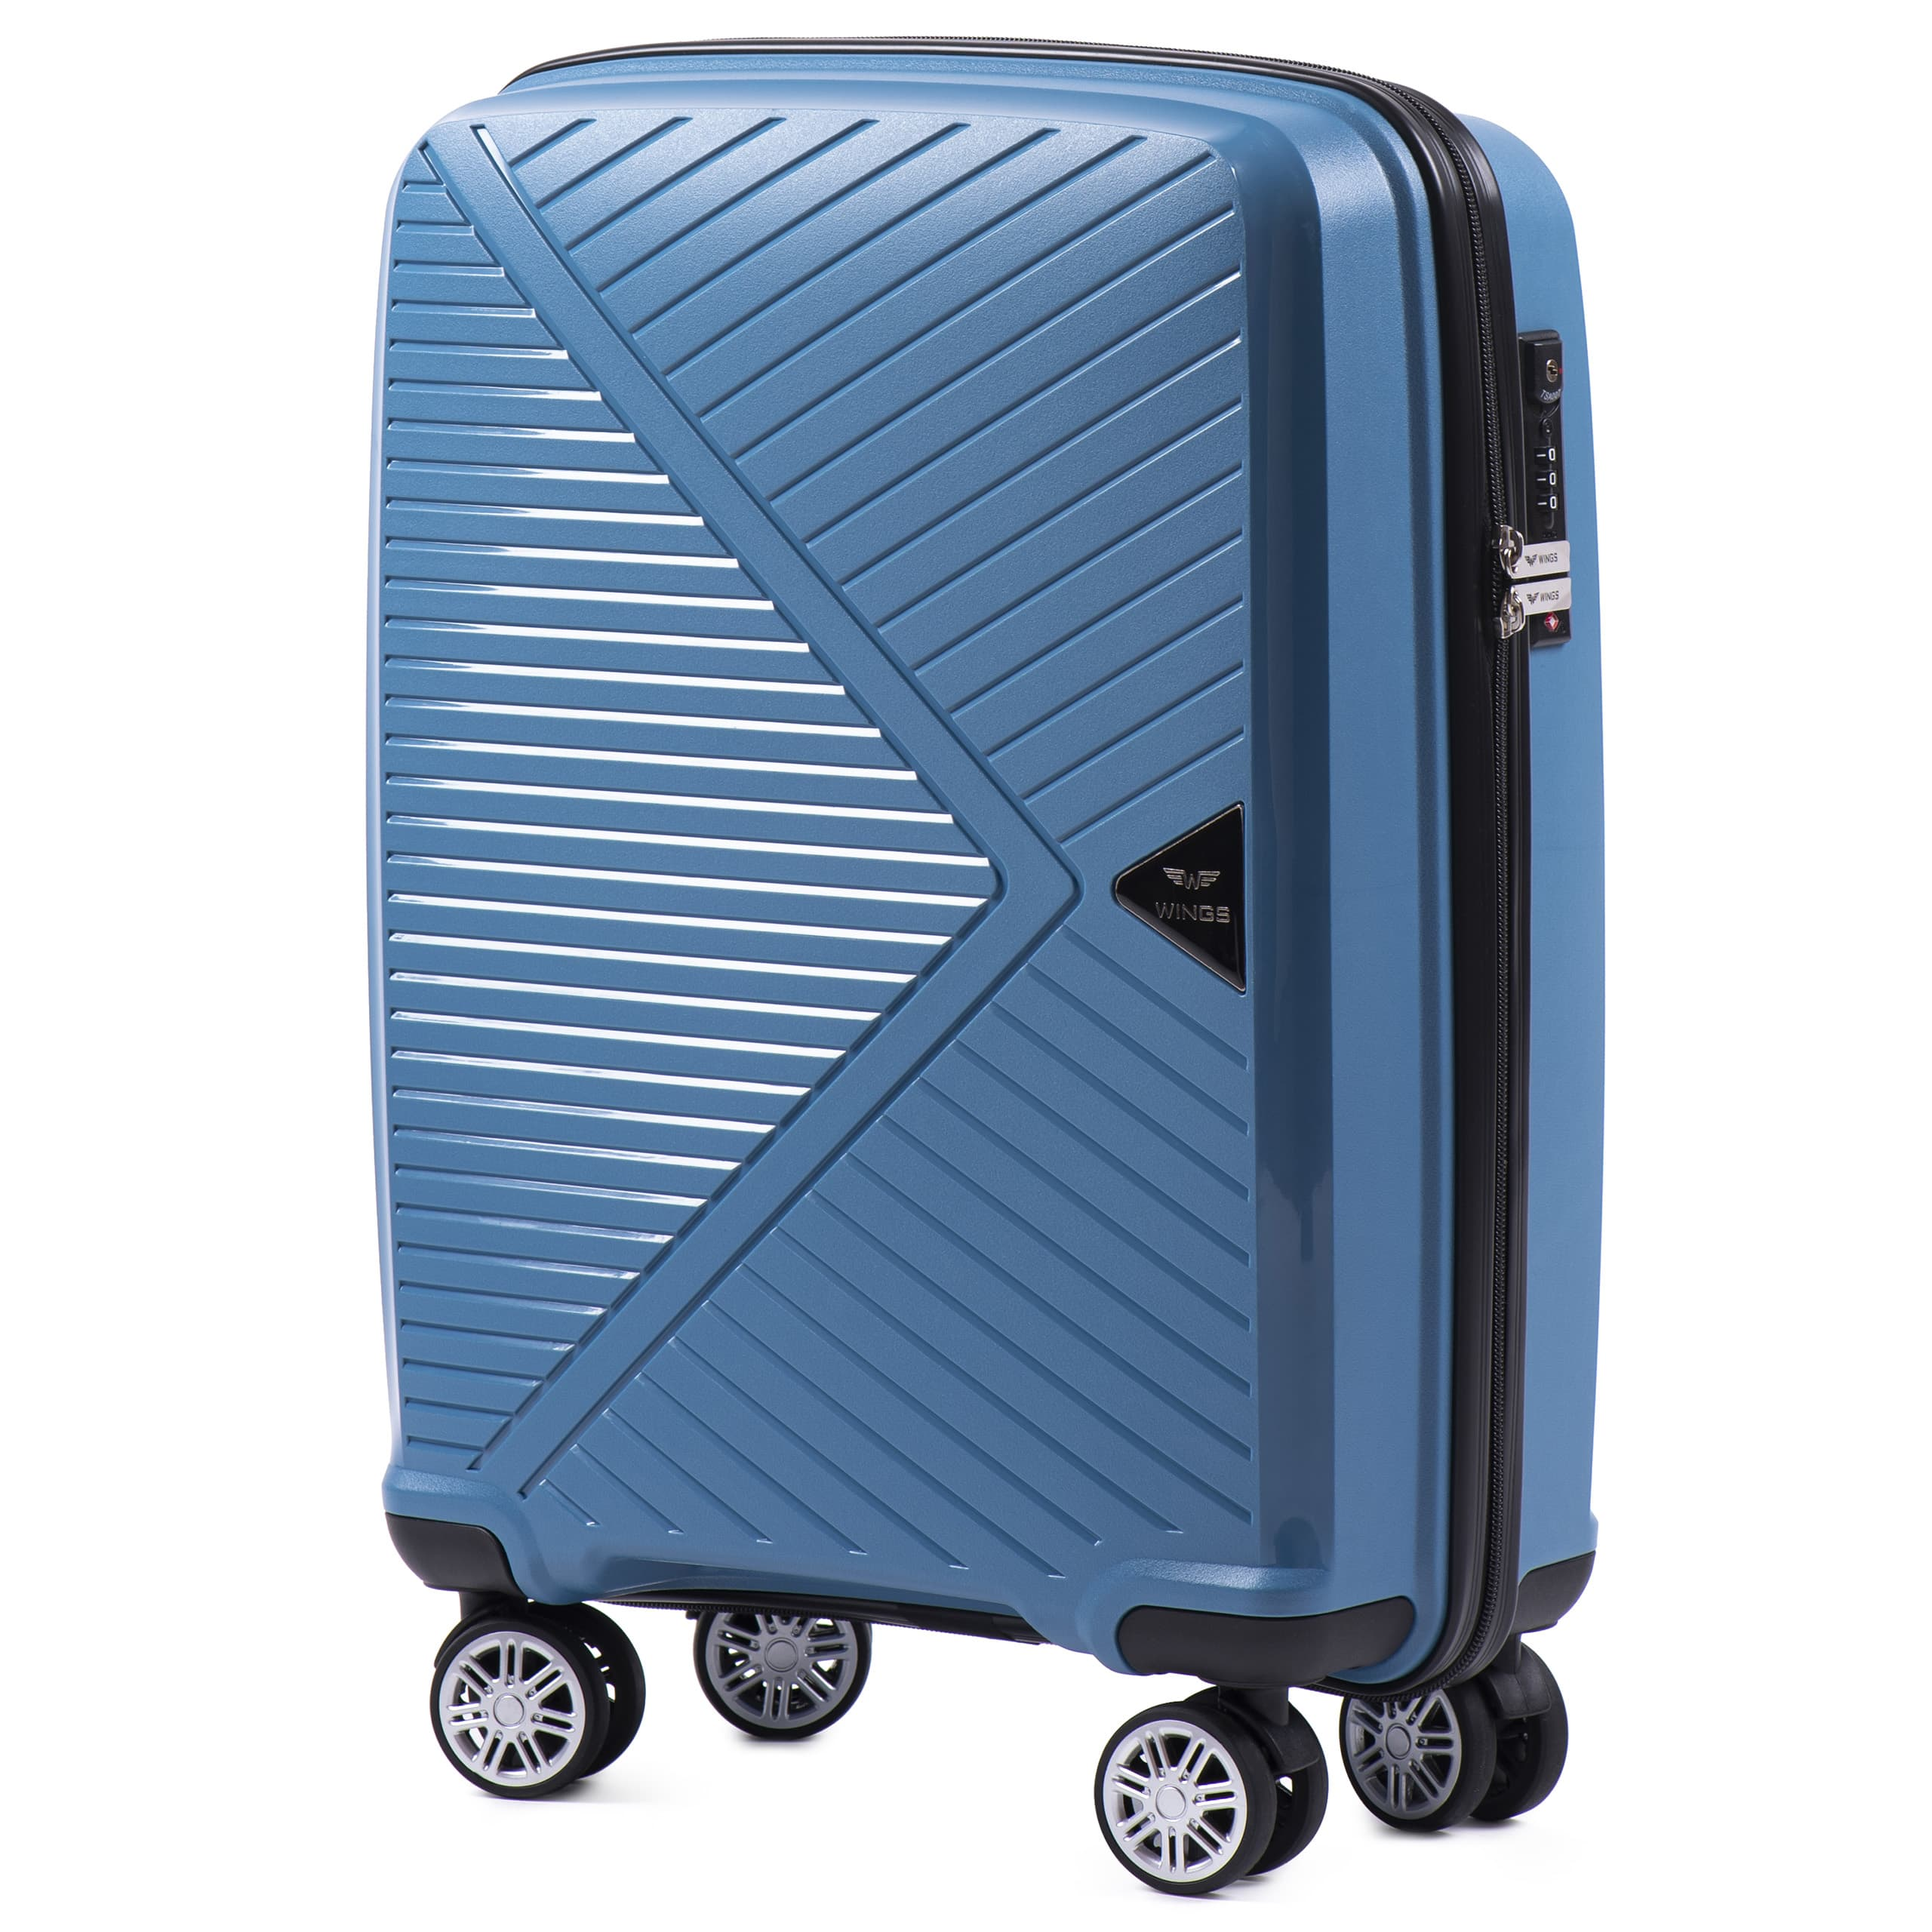 Valiza  din polipropilena pe 4 roti.Pt bagajul de maina ,pina la 7/10 kg